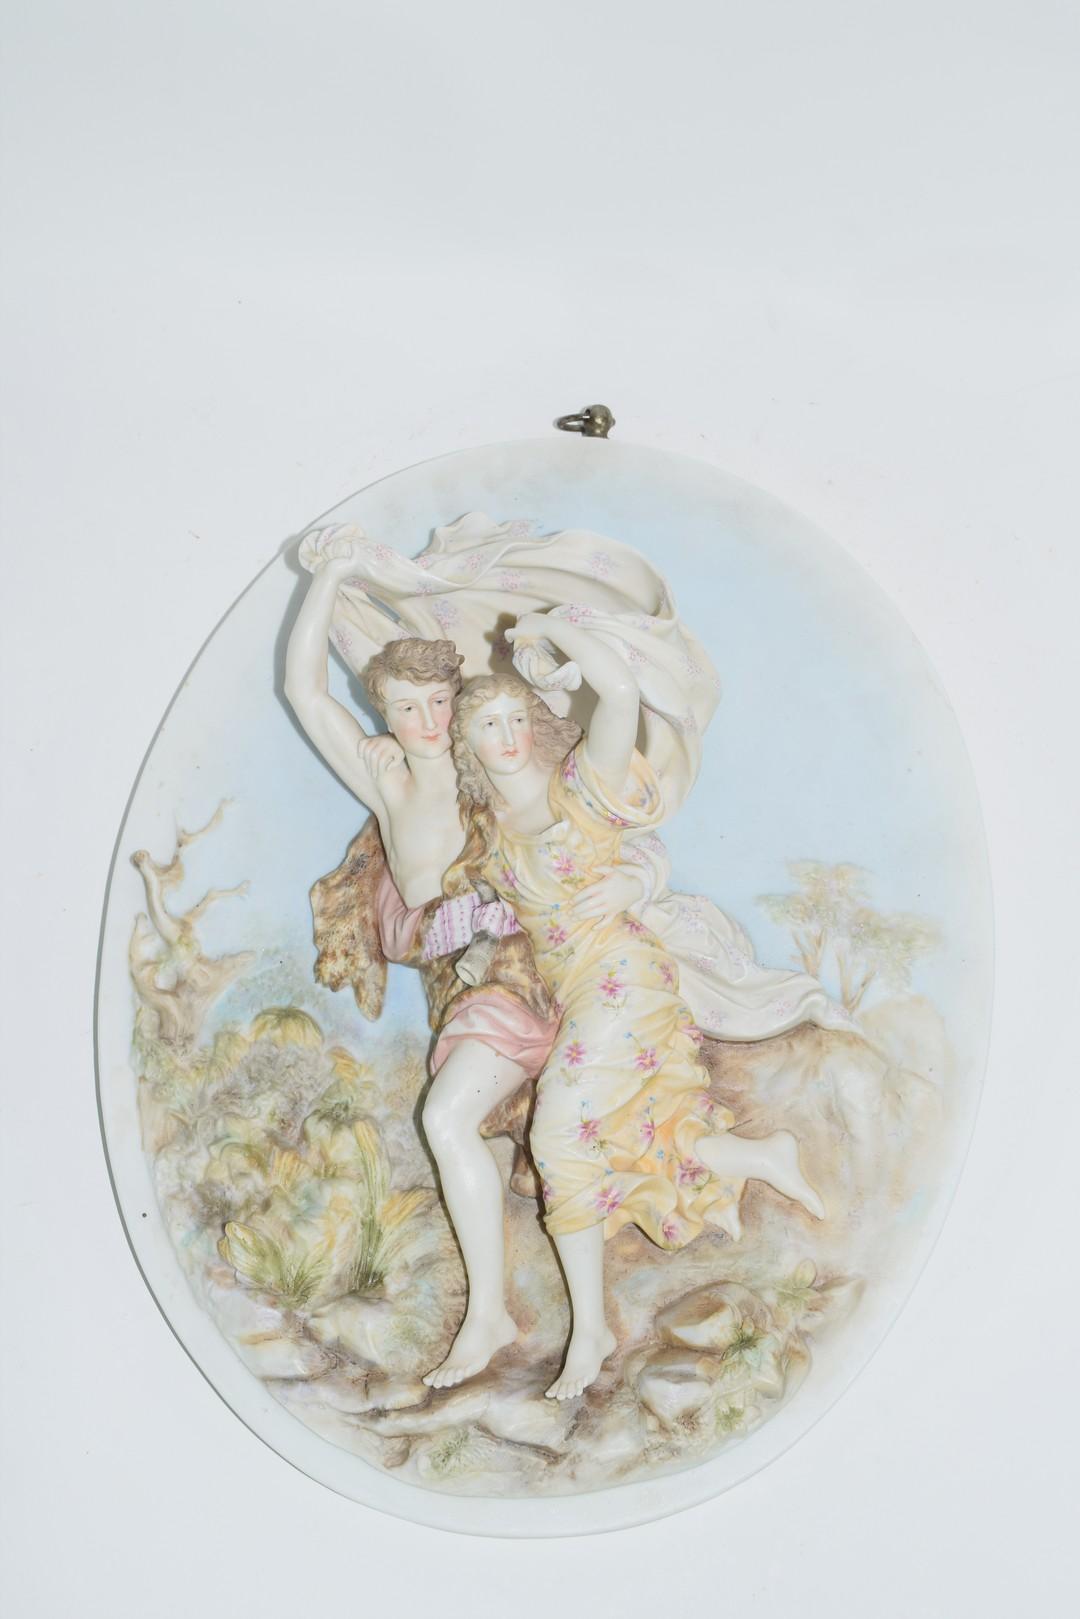 Continental late 19th century porcelain plaque